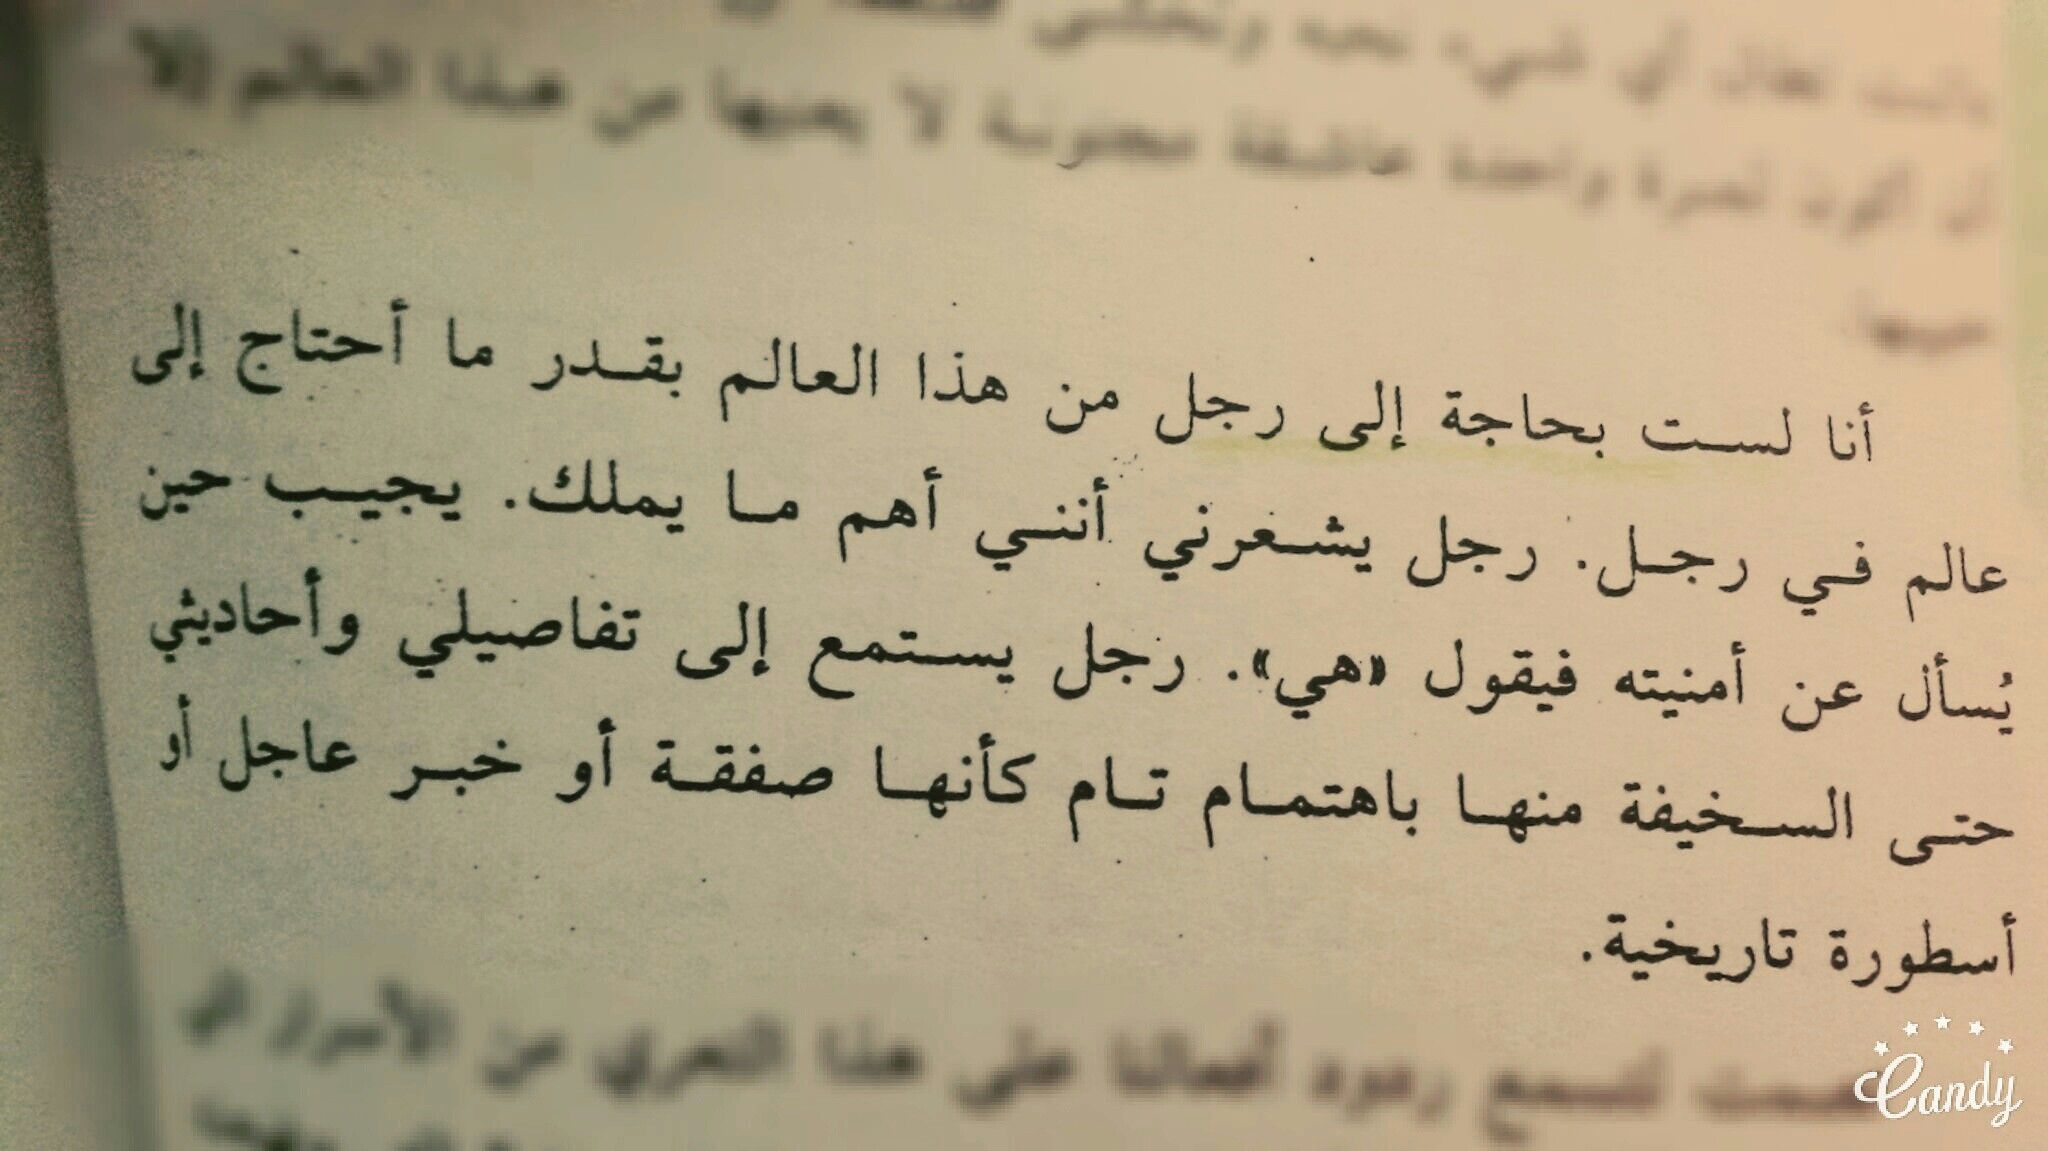 Pin By Yousr Ahmad On اقتباسات مما راق لي كتبي Photography Fundamentals Math